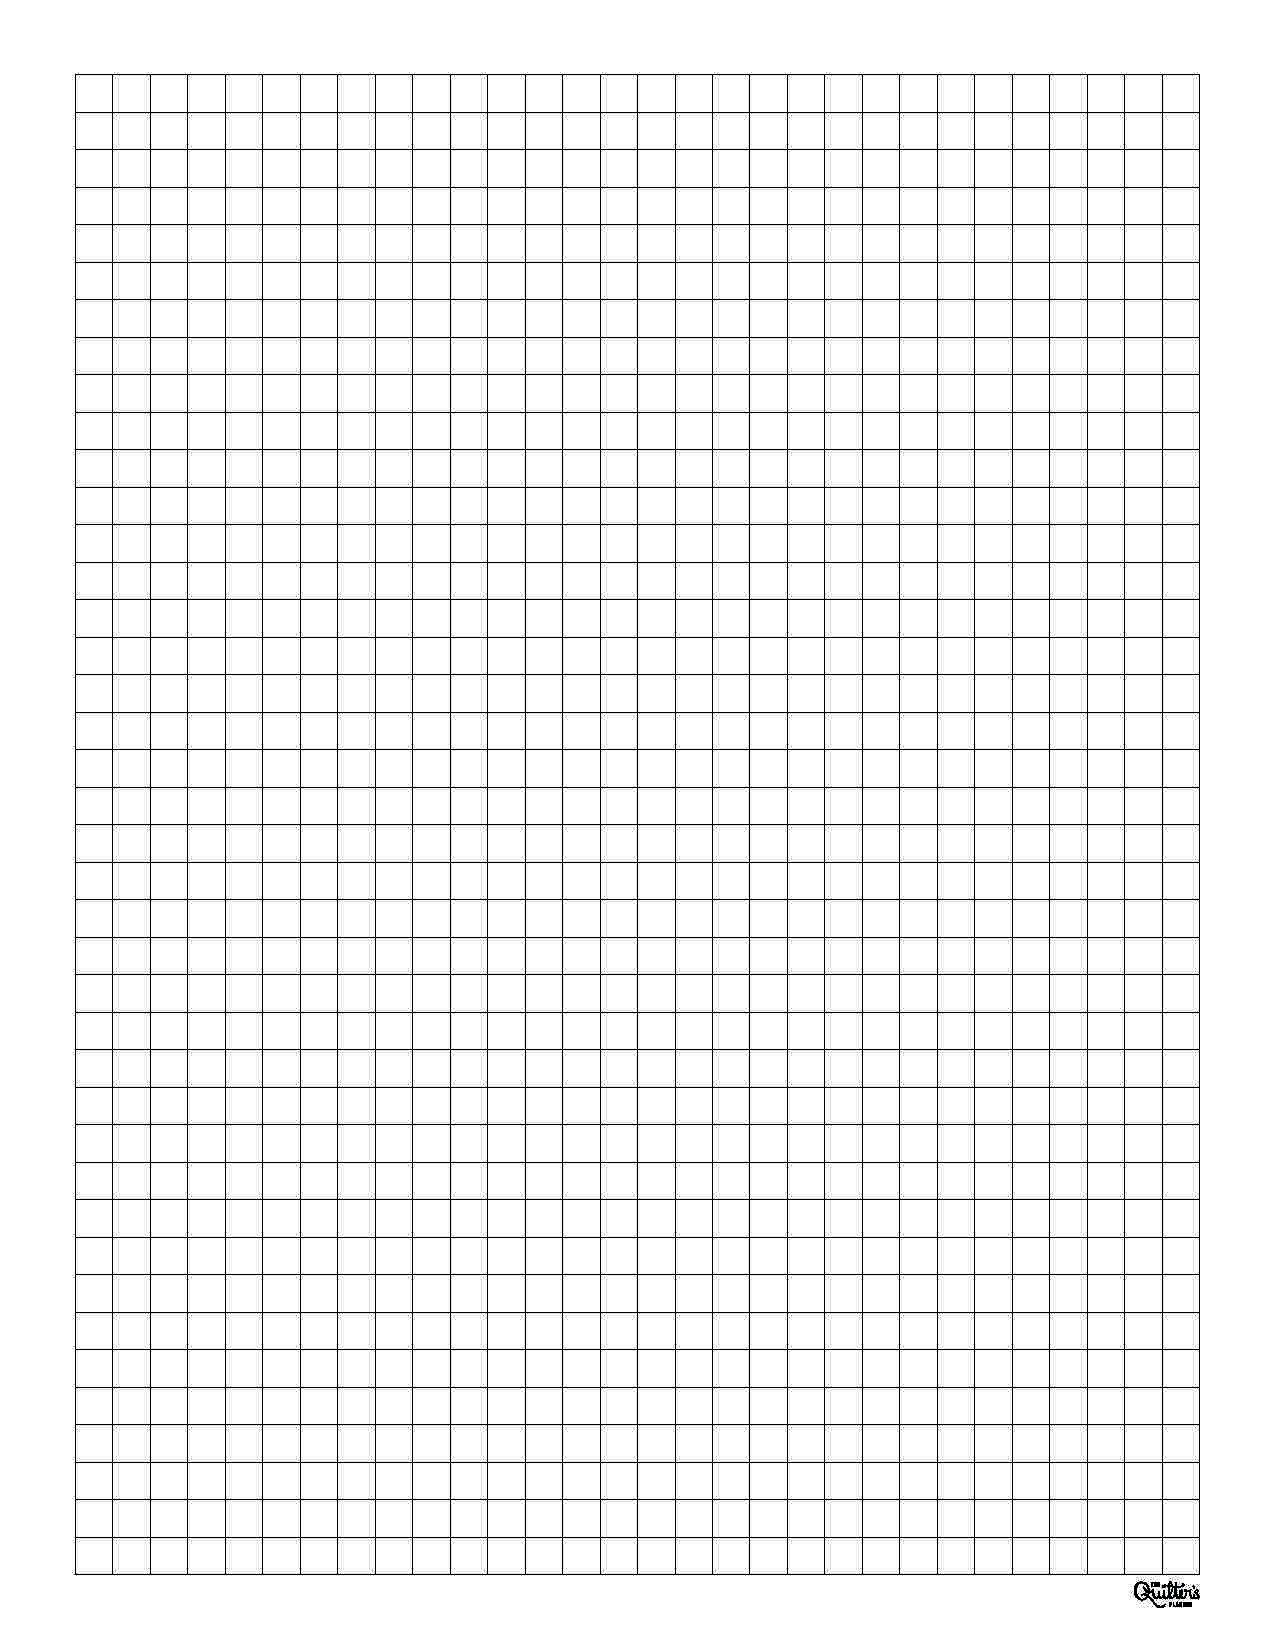 squares graph paper 4 squares per inch crochet charts